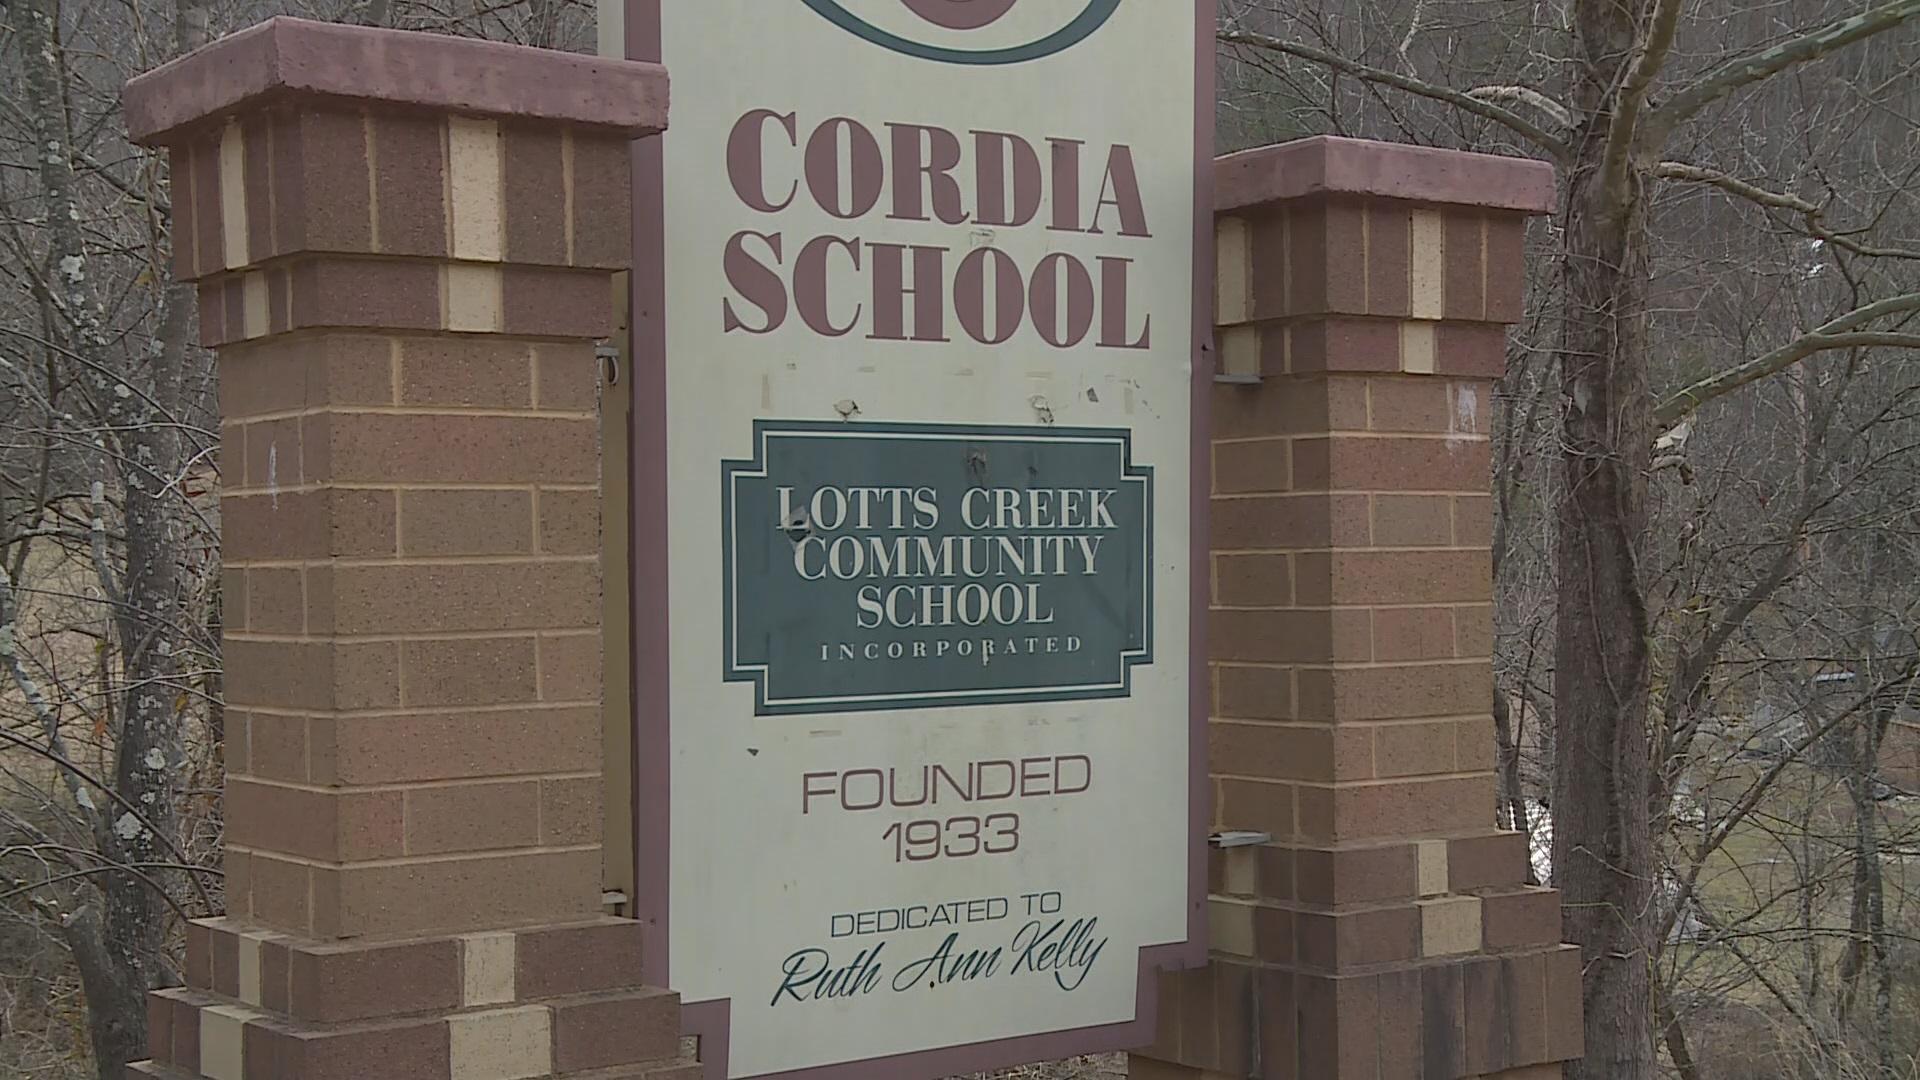 Restraining Order Issued in Cordia School Case